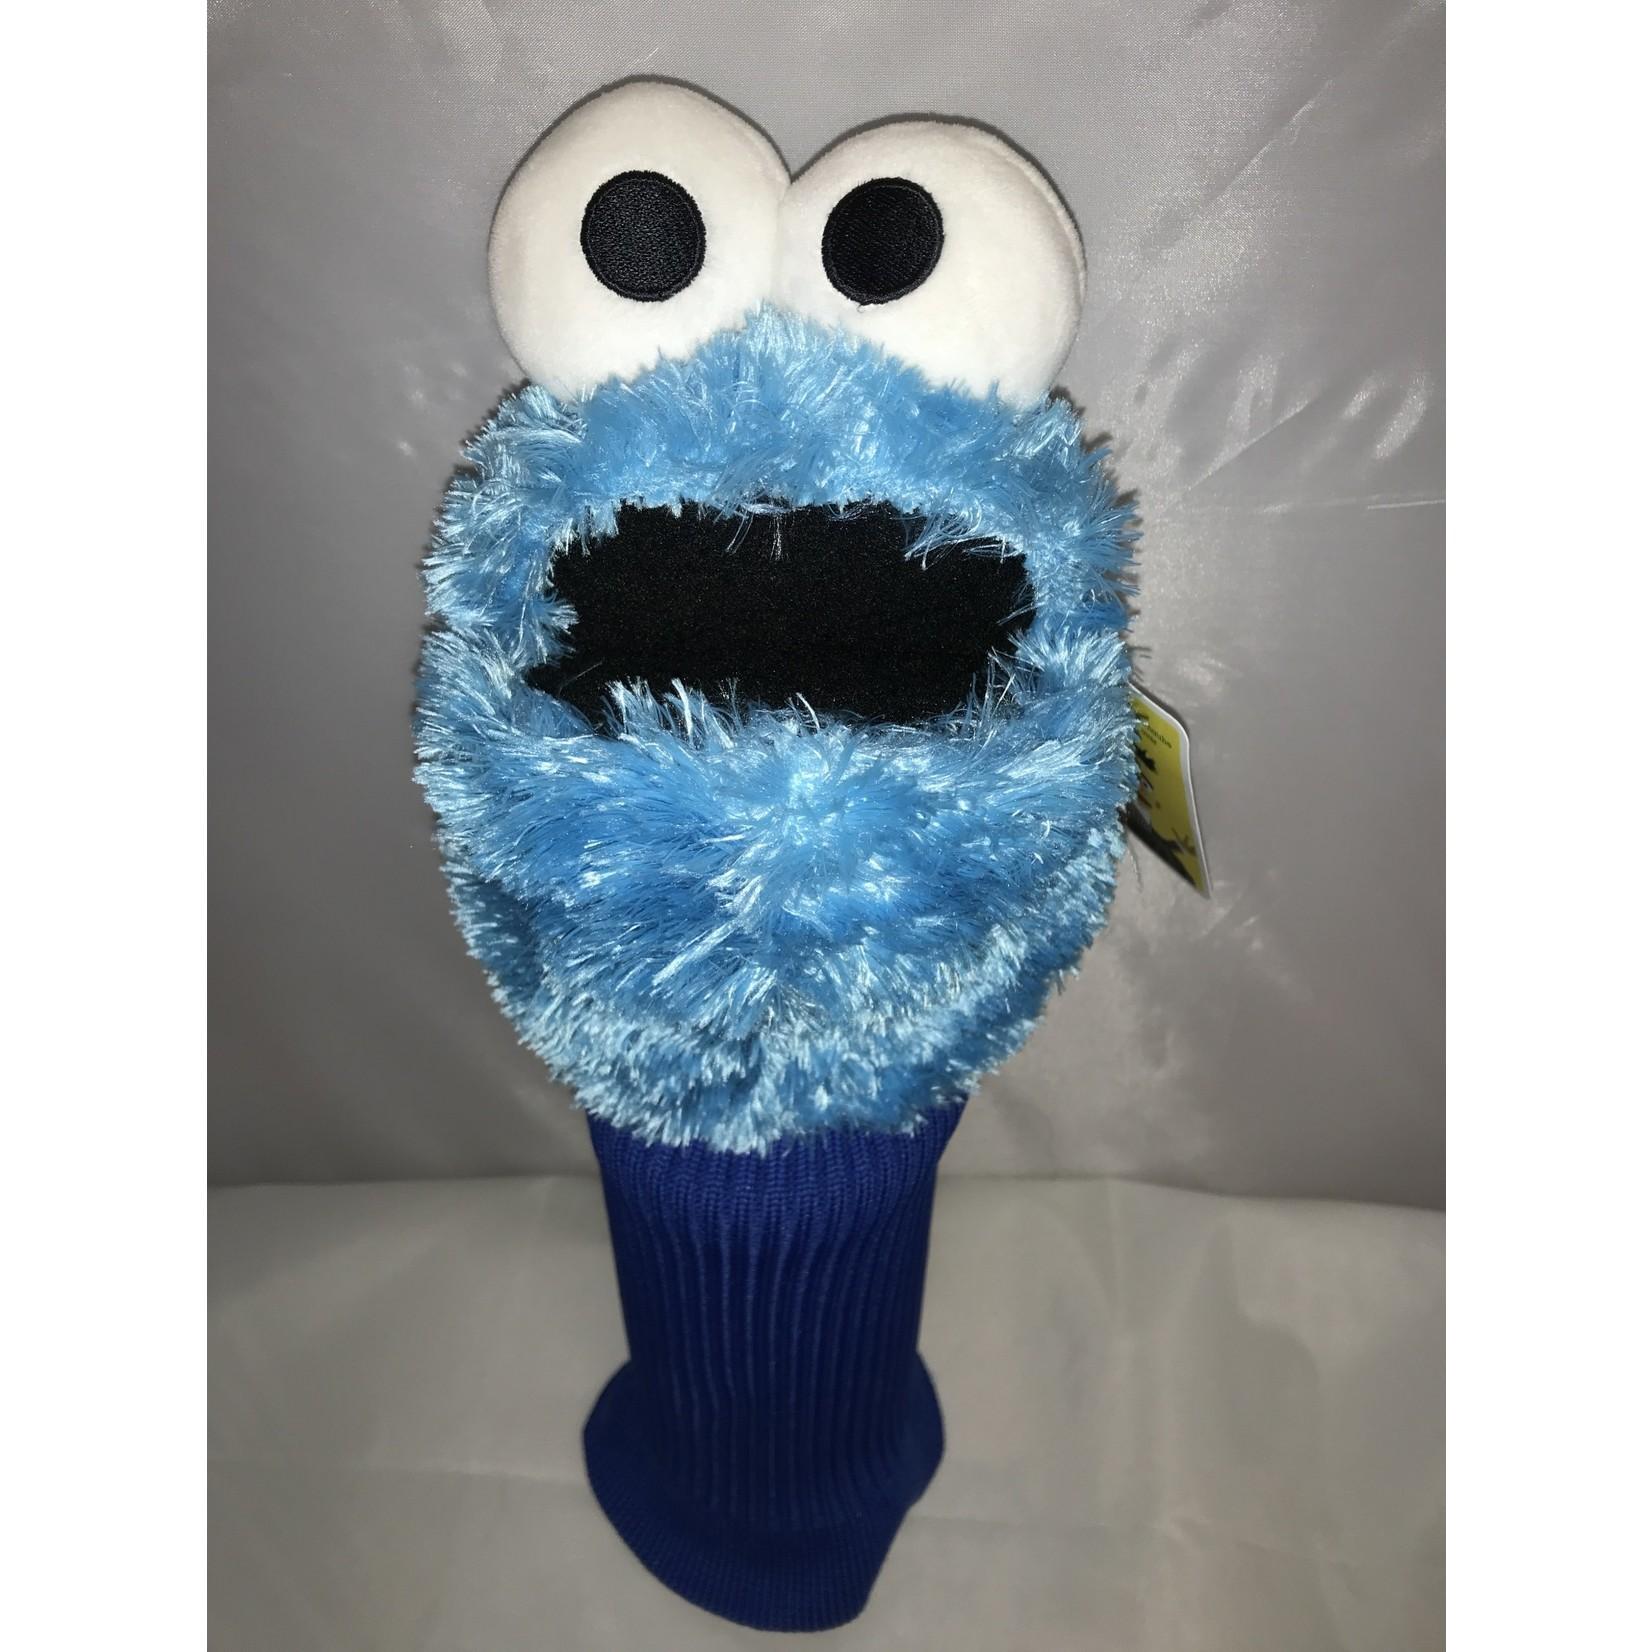 Sesamestreet Sesamestreet Headcover Cookie